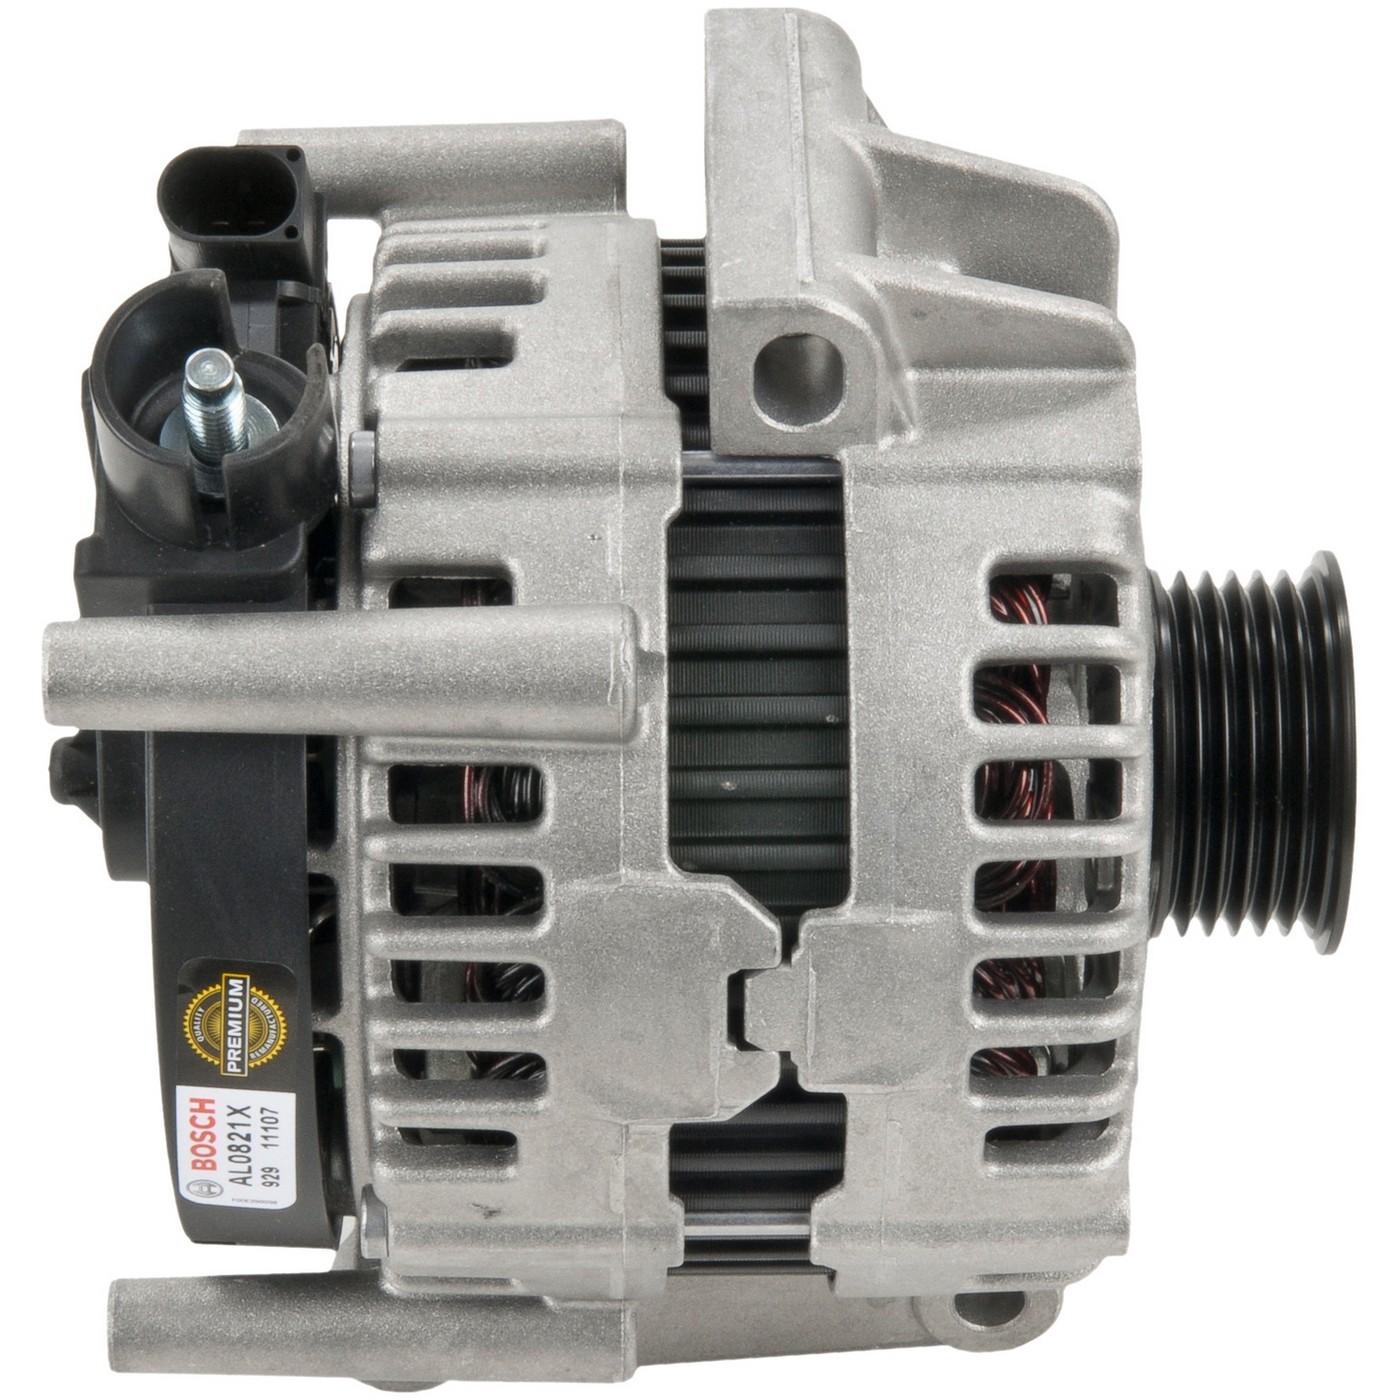 VOLVO Premium Reman Alternator Bosch AL9409X